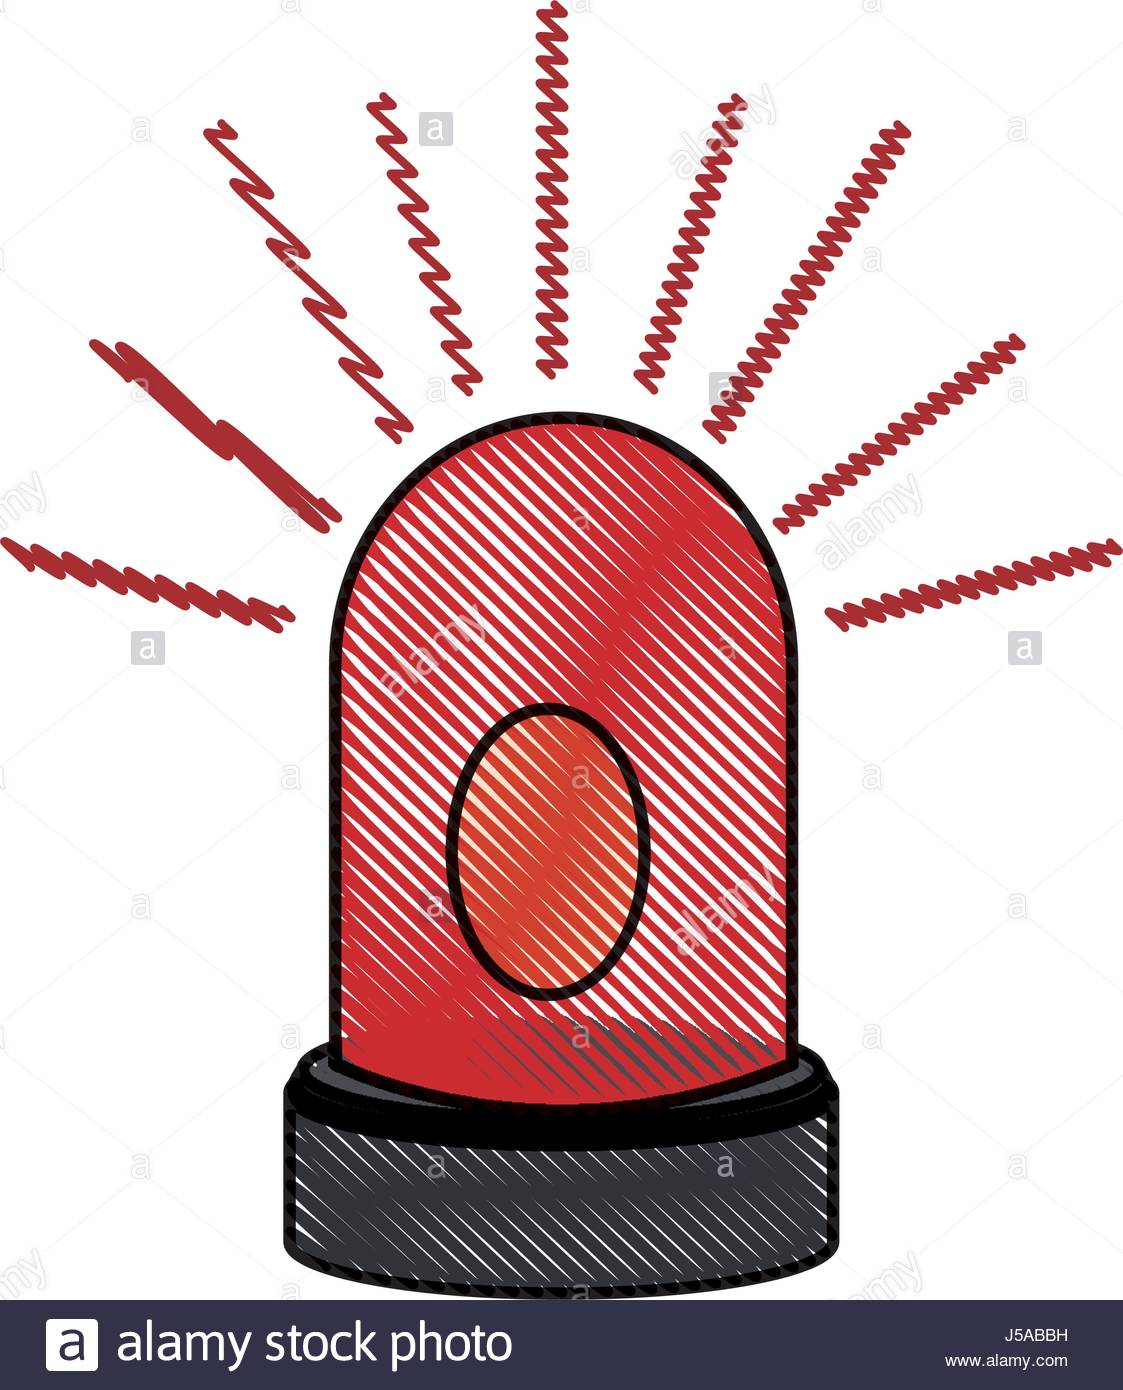 1123x1390 Drawing Alarm Warning Technology System Virus Stock Vector Art